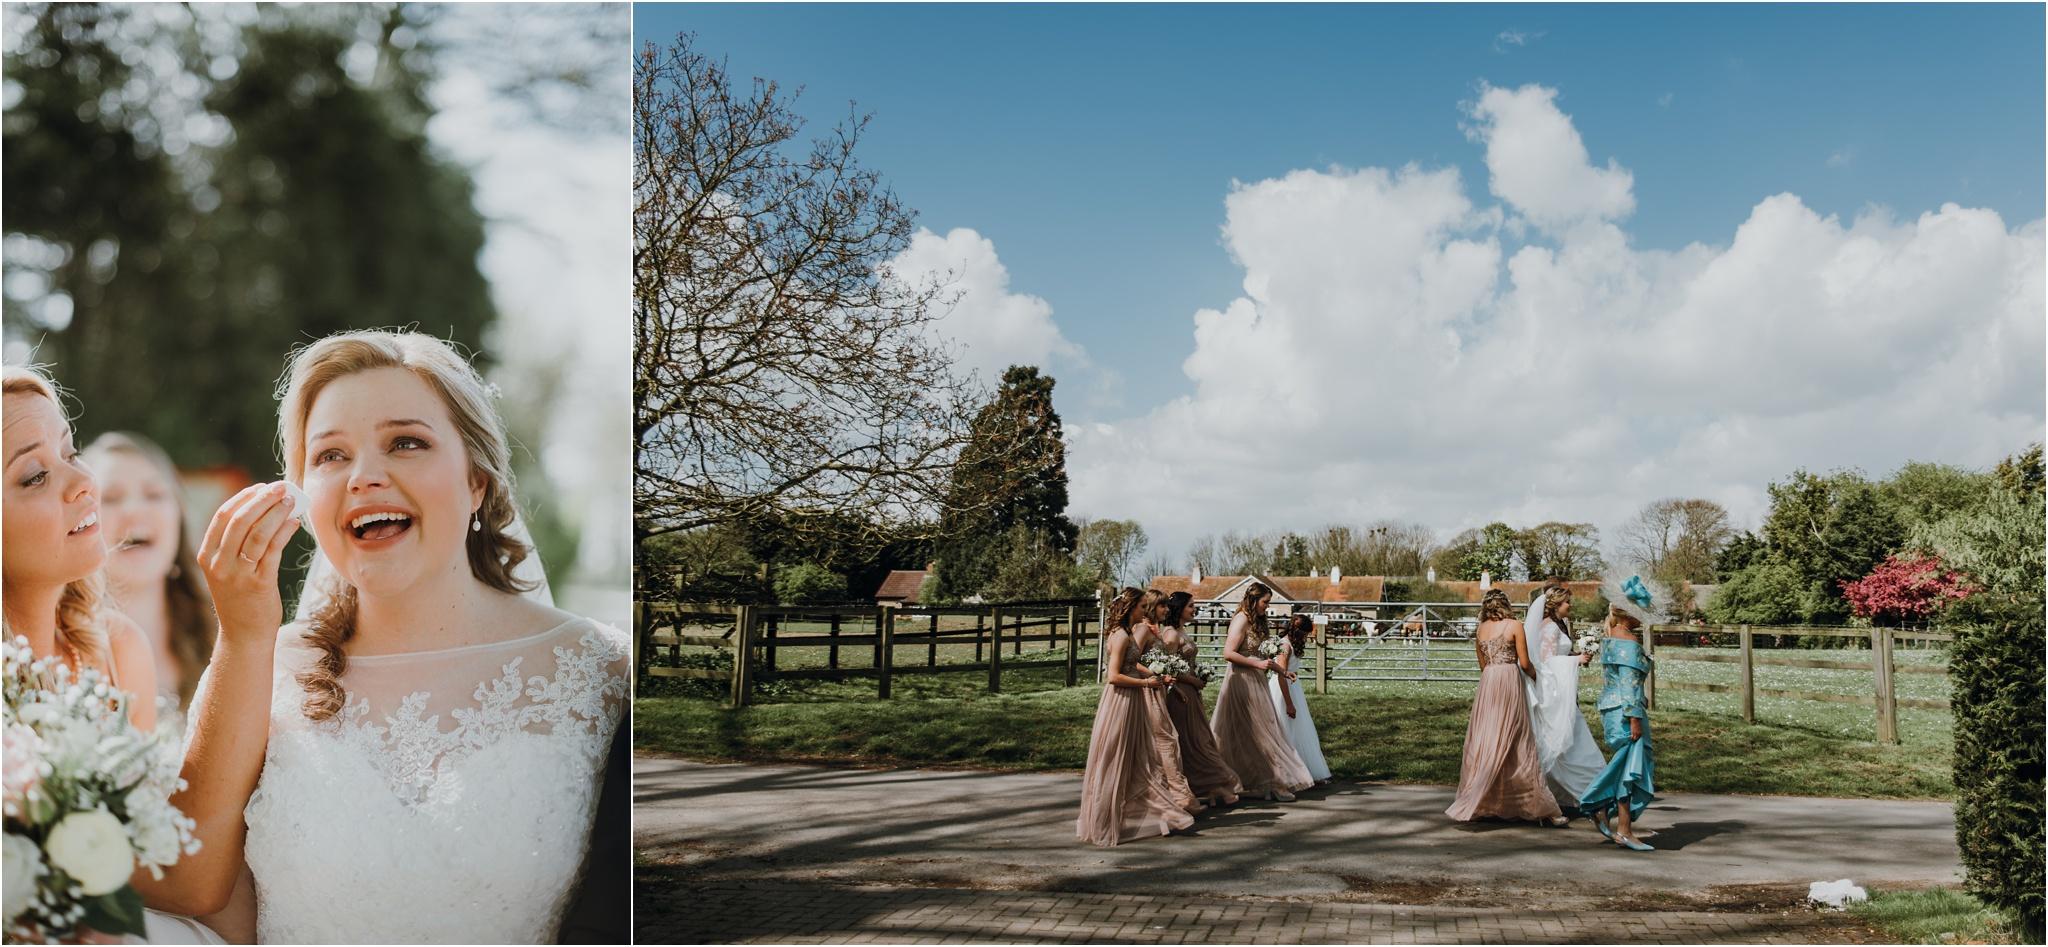 Outdoor-country-wedding-Edinburgh-photographer__0056.jpg